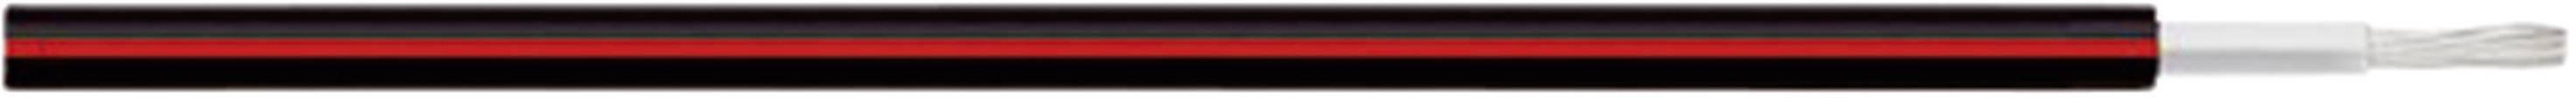 Fotovoltaický kabel ÖLFLEX® SOLAR XLR-R 1 x 2.50 mm² černá, červená LAPP 0023390 500 m